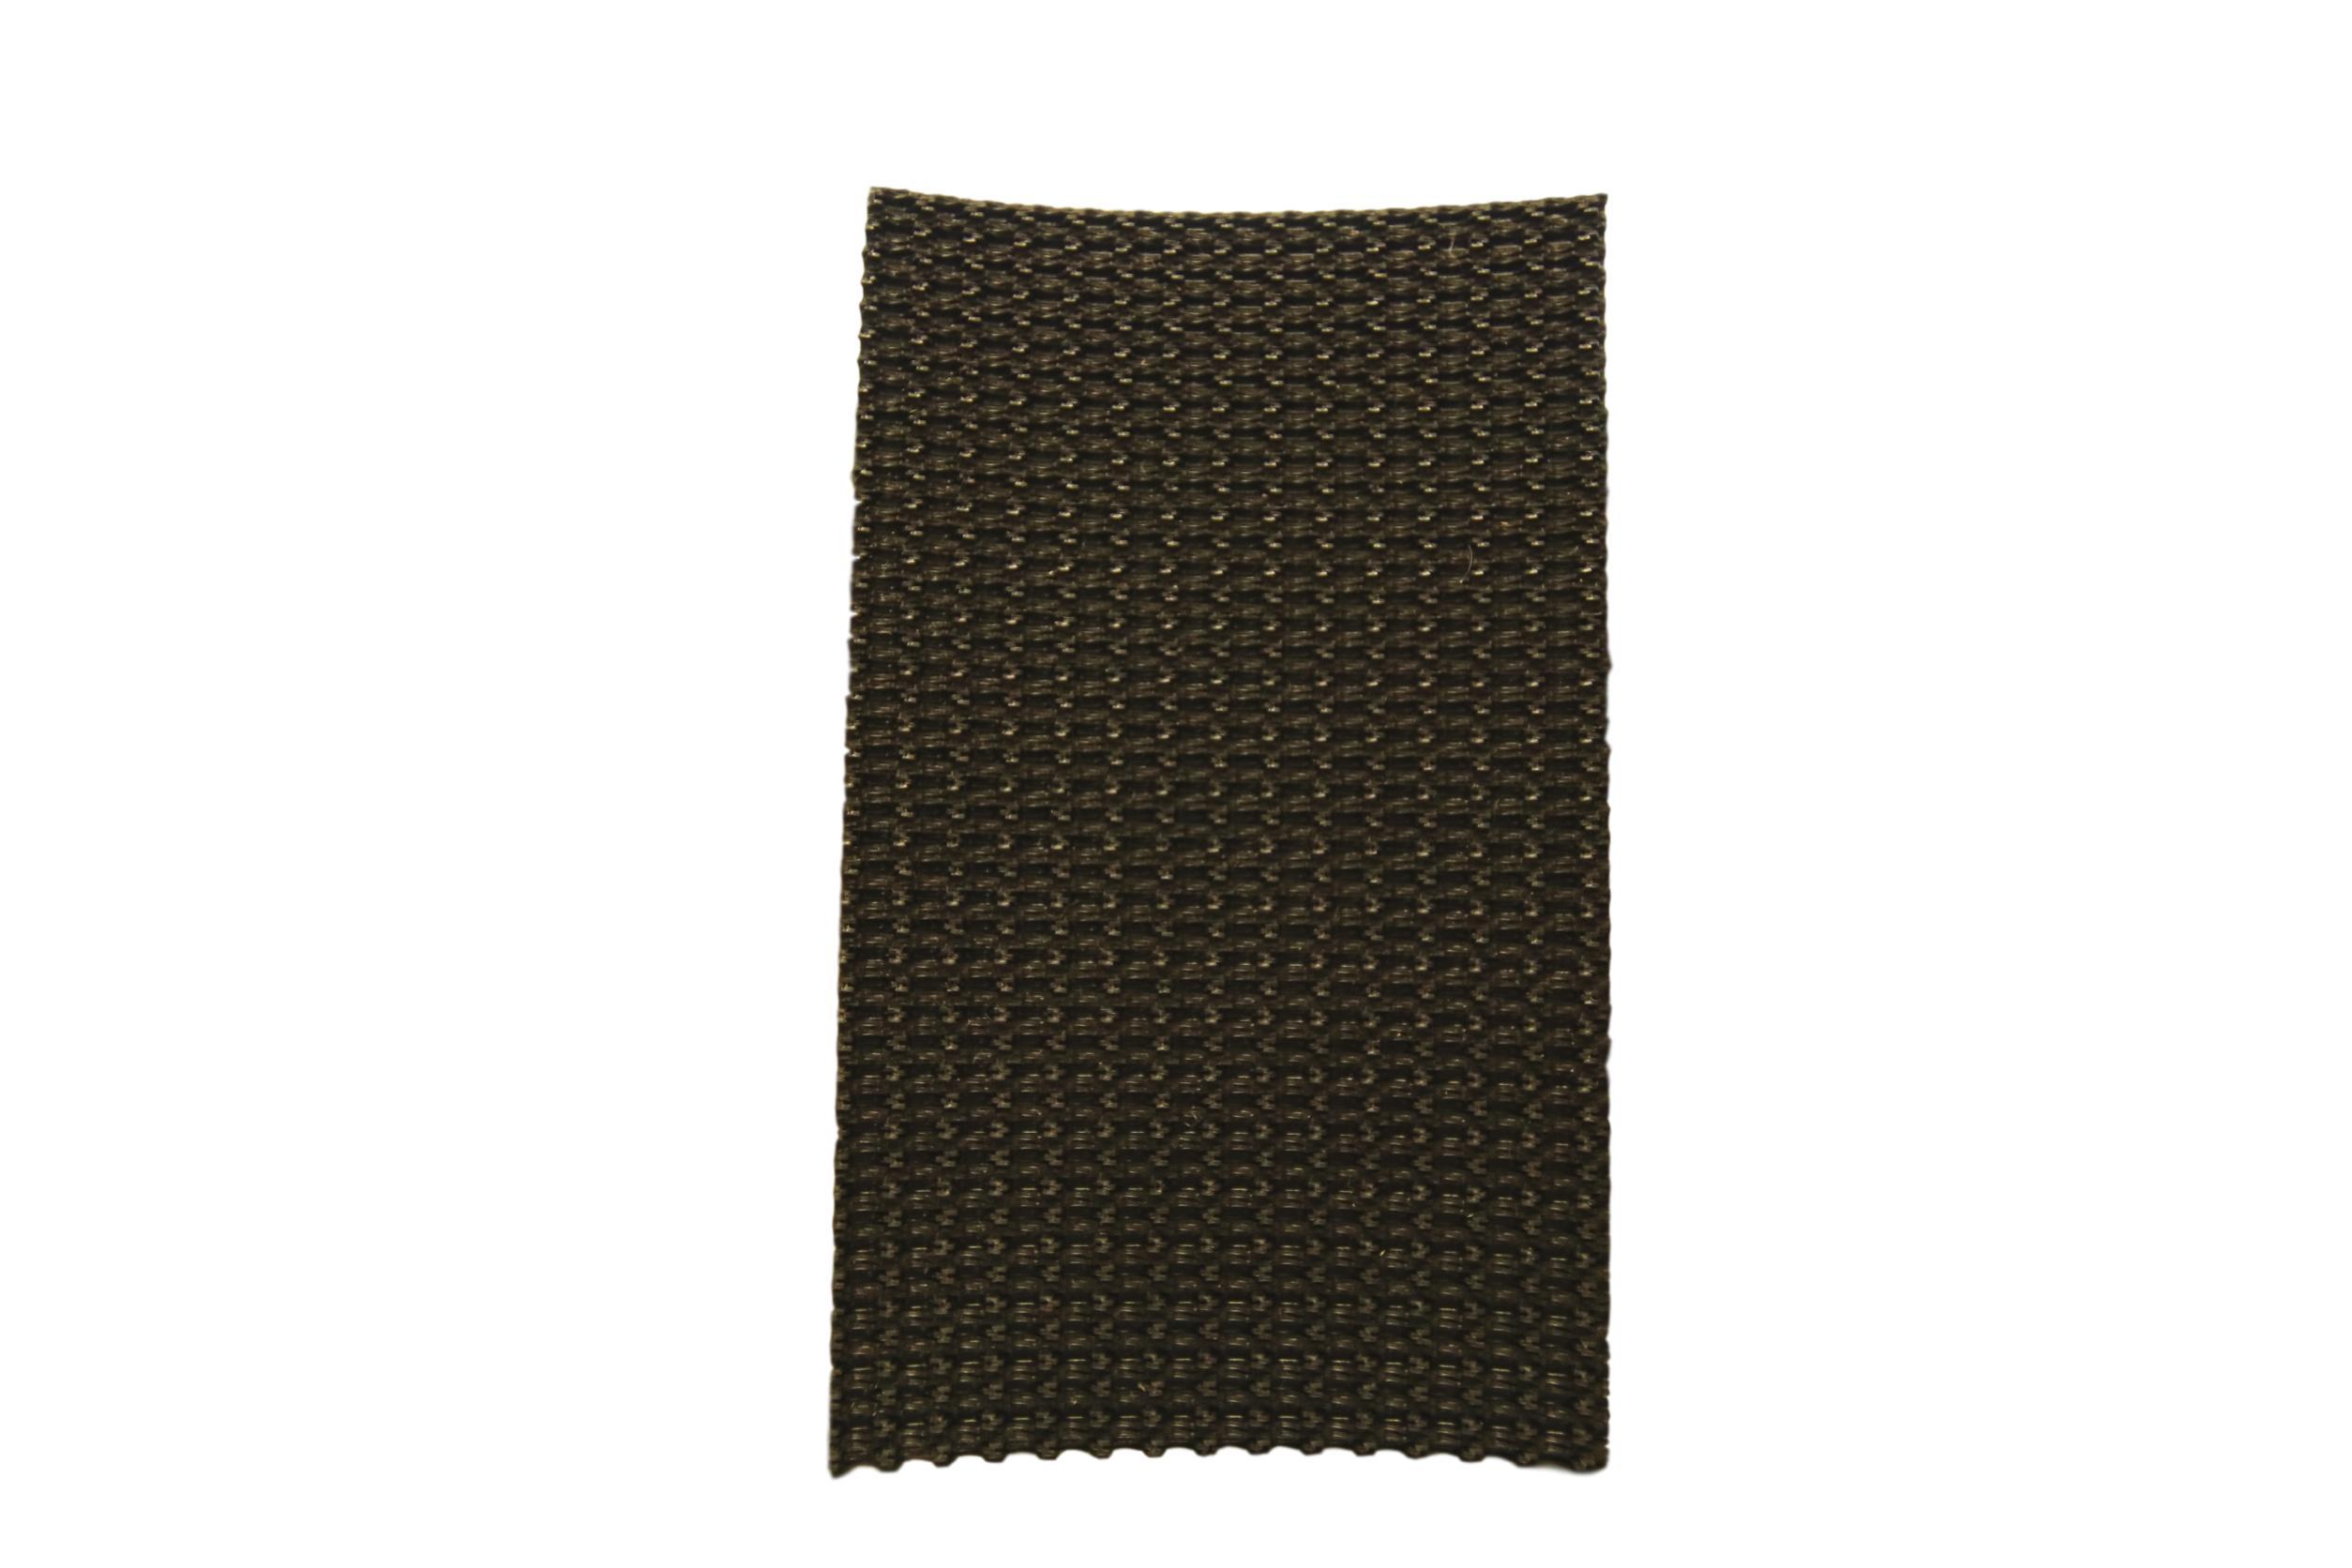 Conveyor Belting Black Grip Face PLY Fabric Back 5.5mm